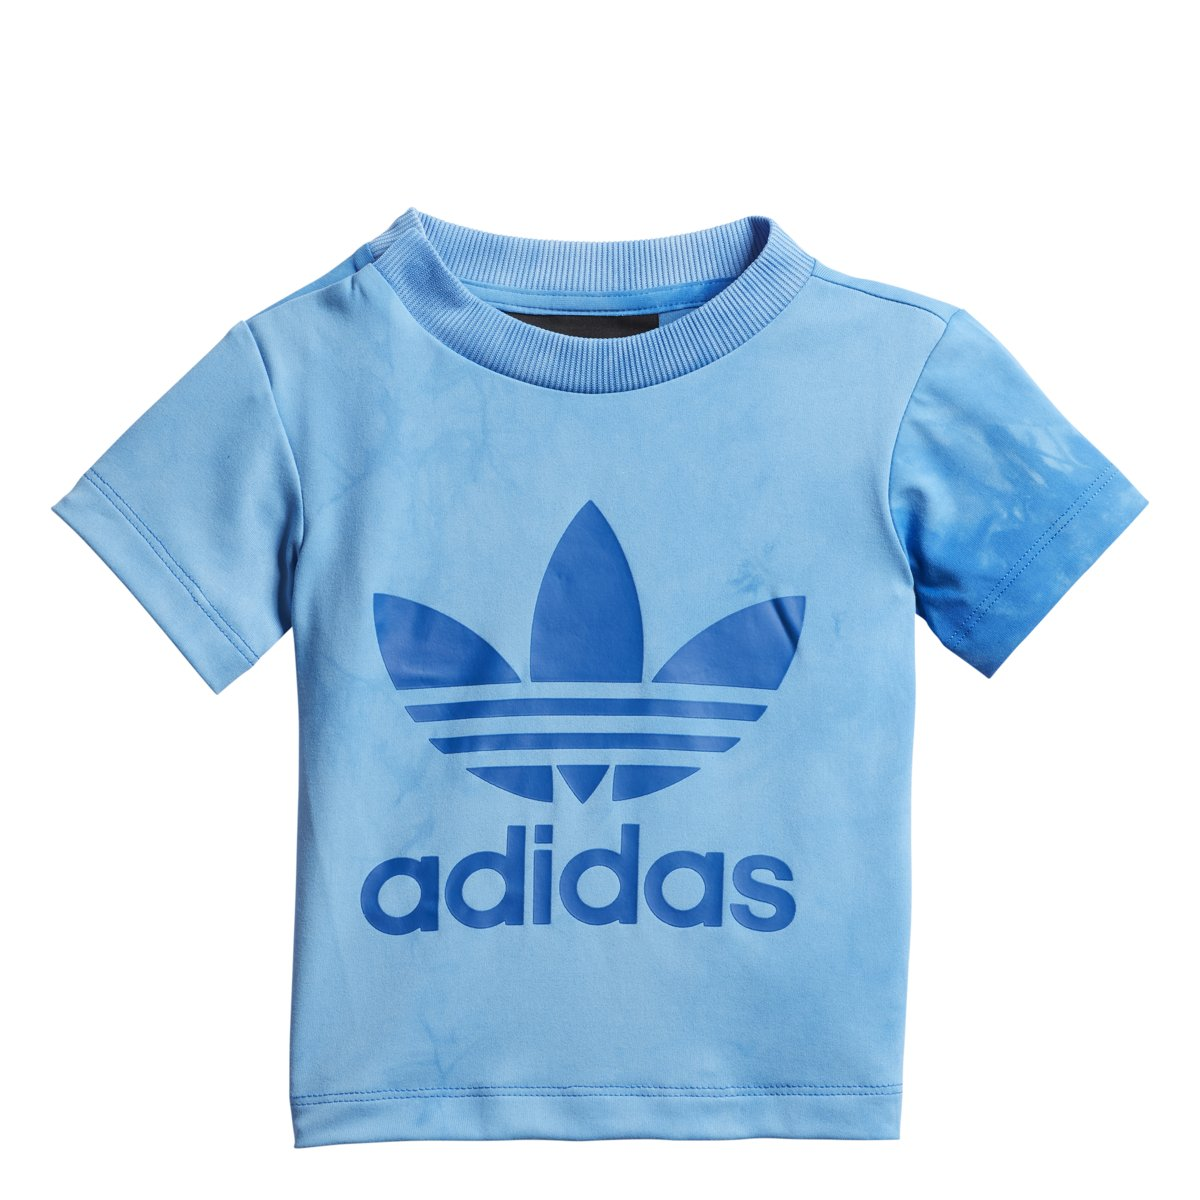 51bdcd5a6 Amazon.com  adidas Originals Pharrell Williams HU Holi Infants T-Shirt Blue  cz0987 (Size 3M)  Clothing